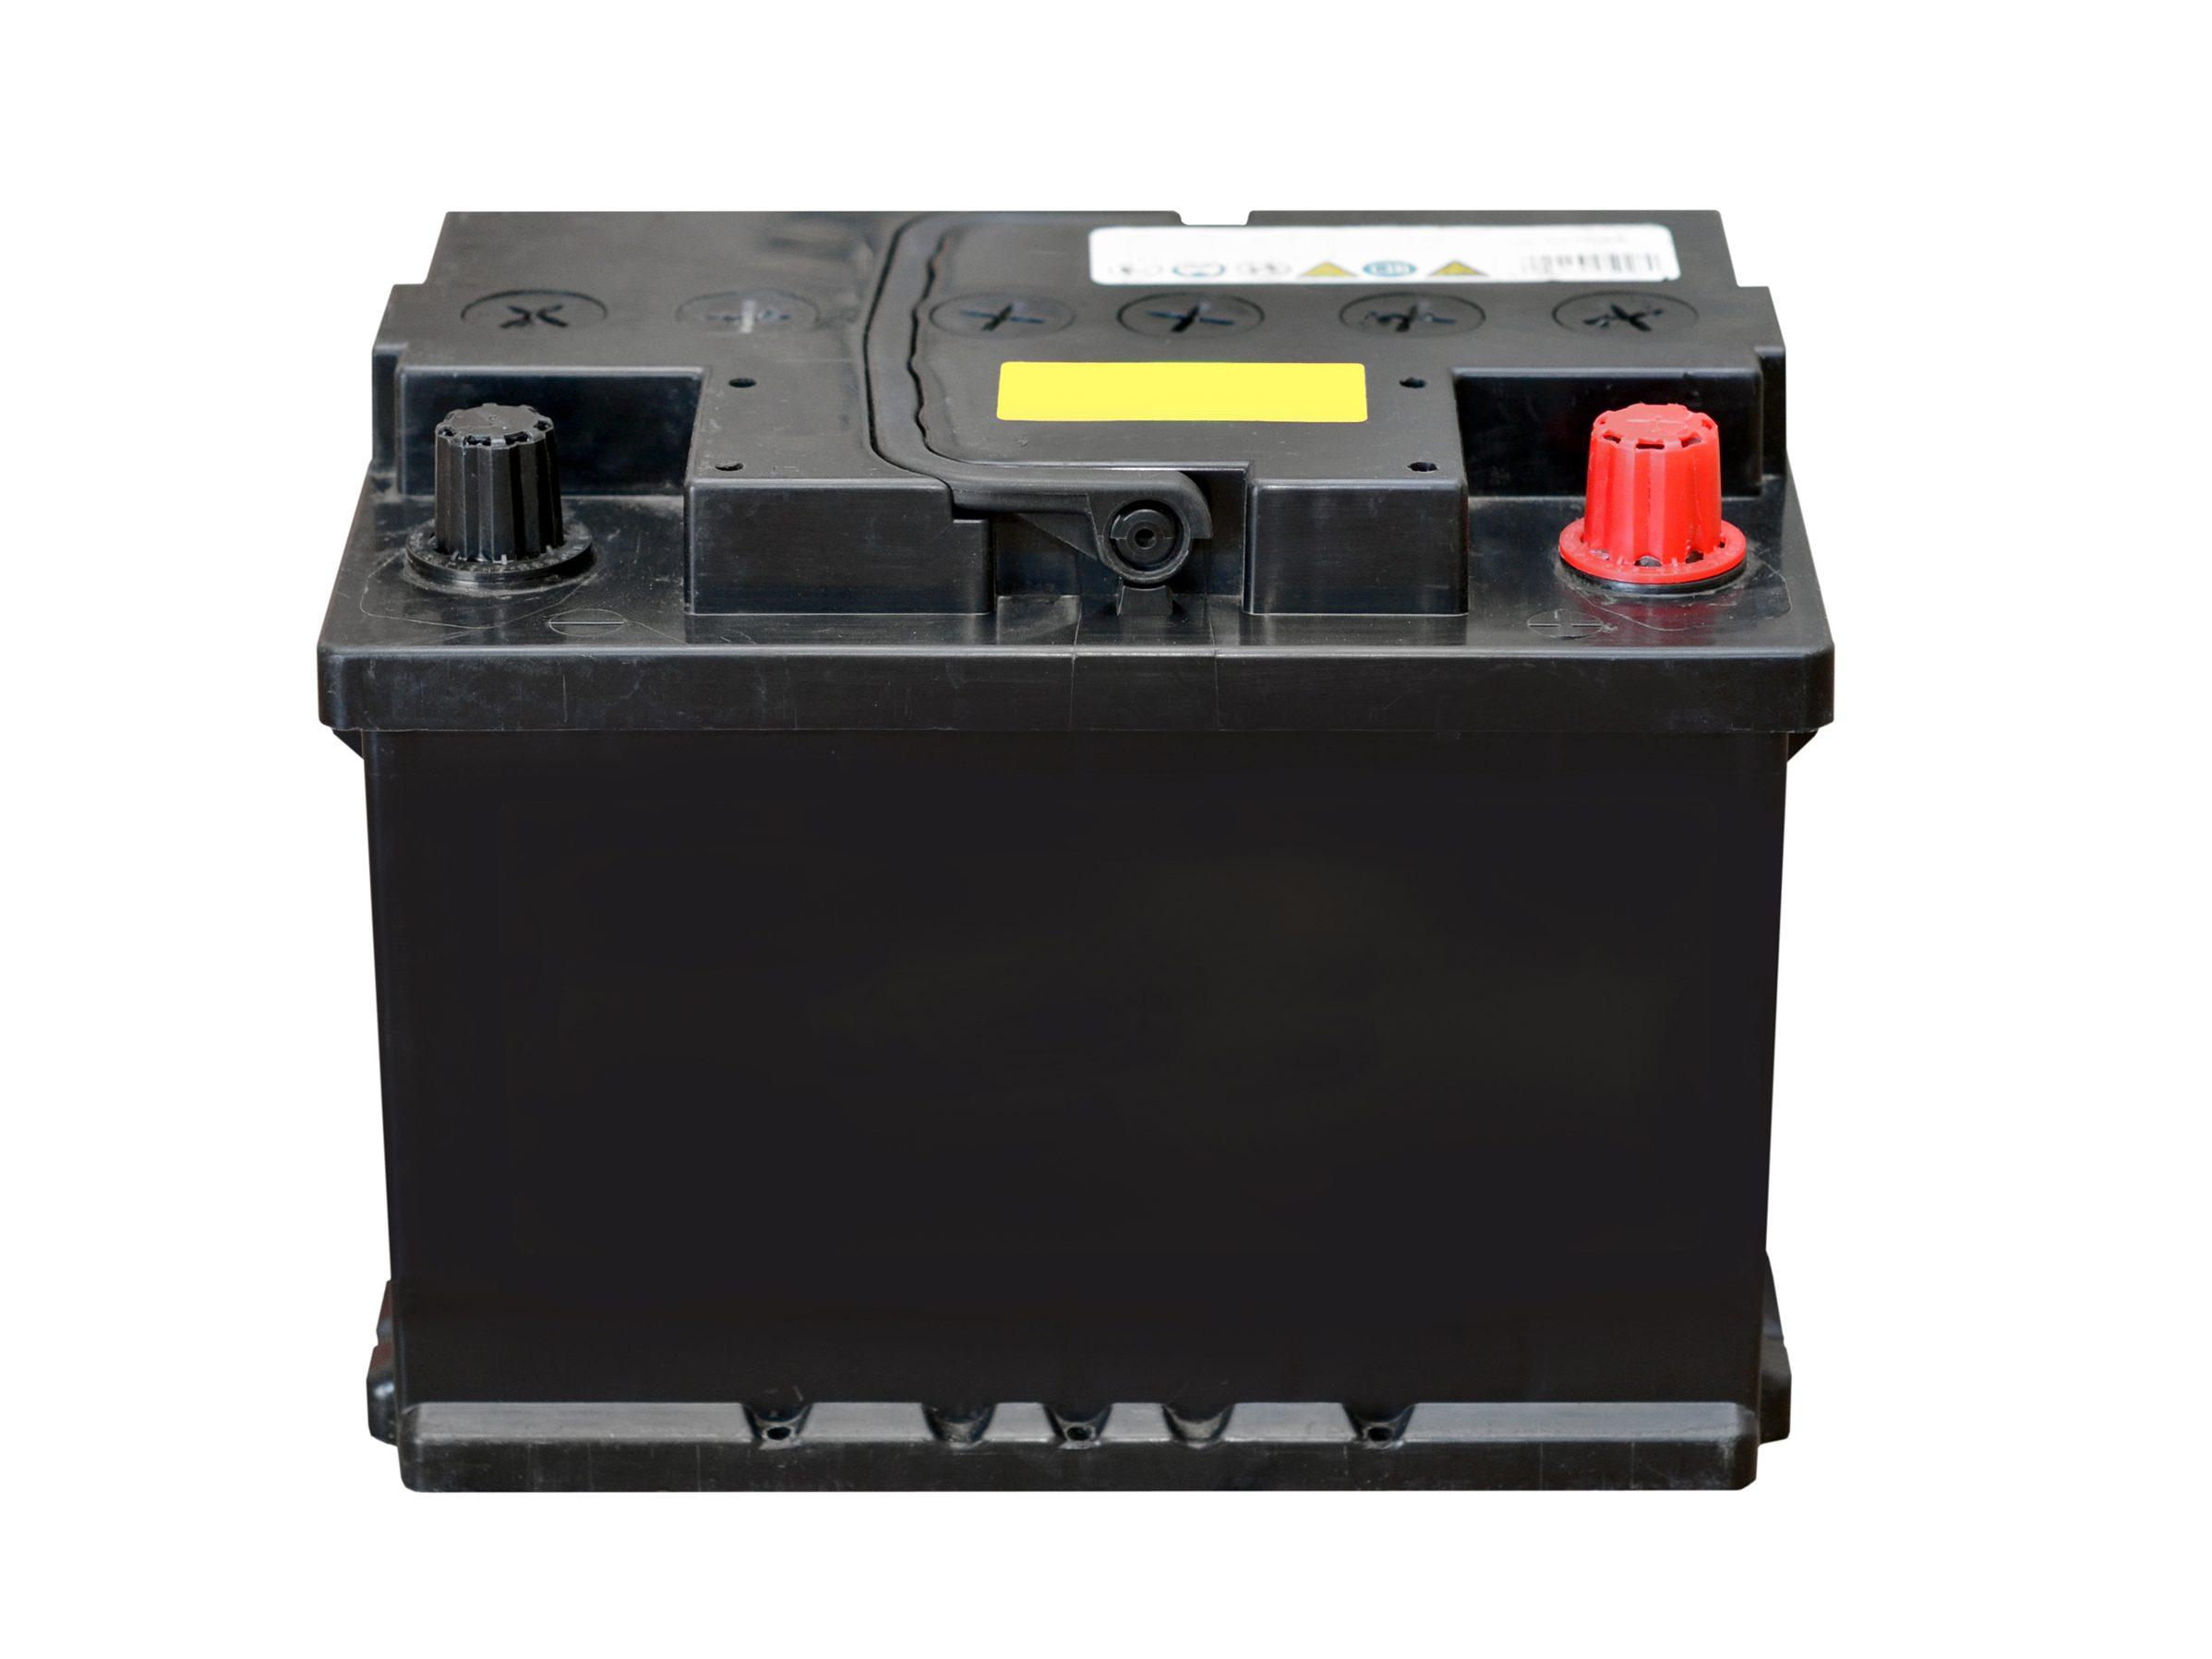 2. Choose a fresh car battery